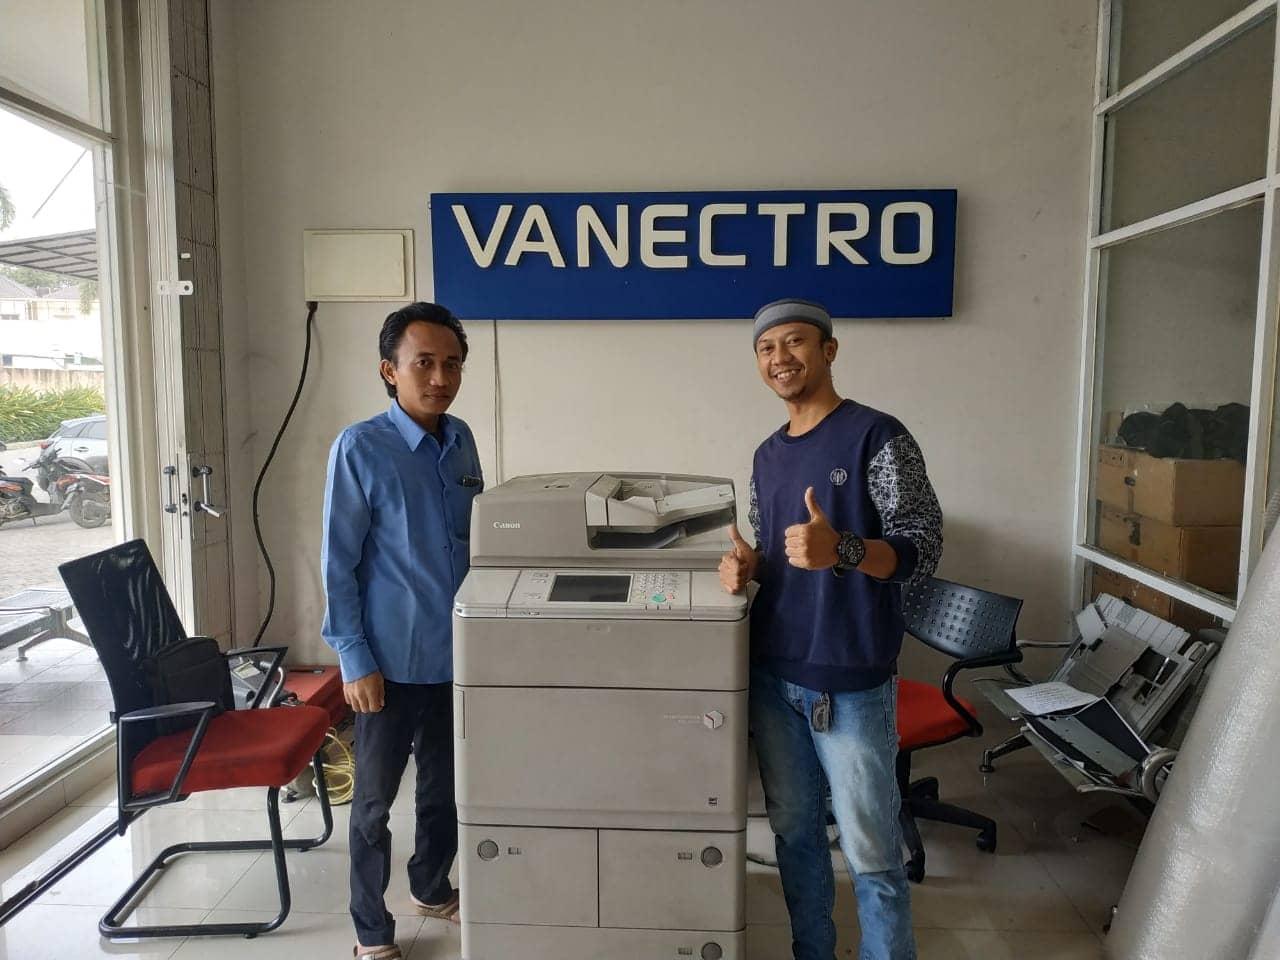 Pengiriman Penjualan Mesin Fotocopy Mesin Fotocopy Canon Ir 5050 Milik Bp. Hendro